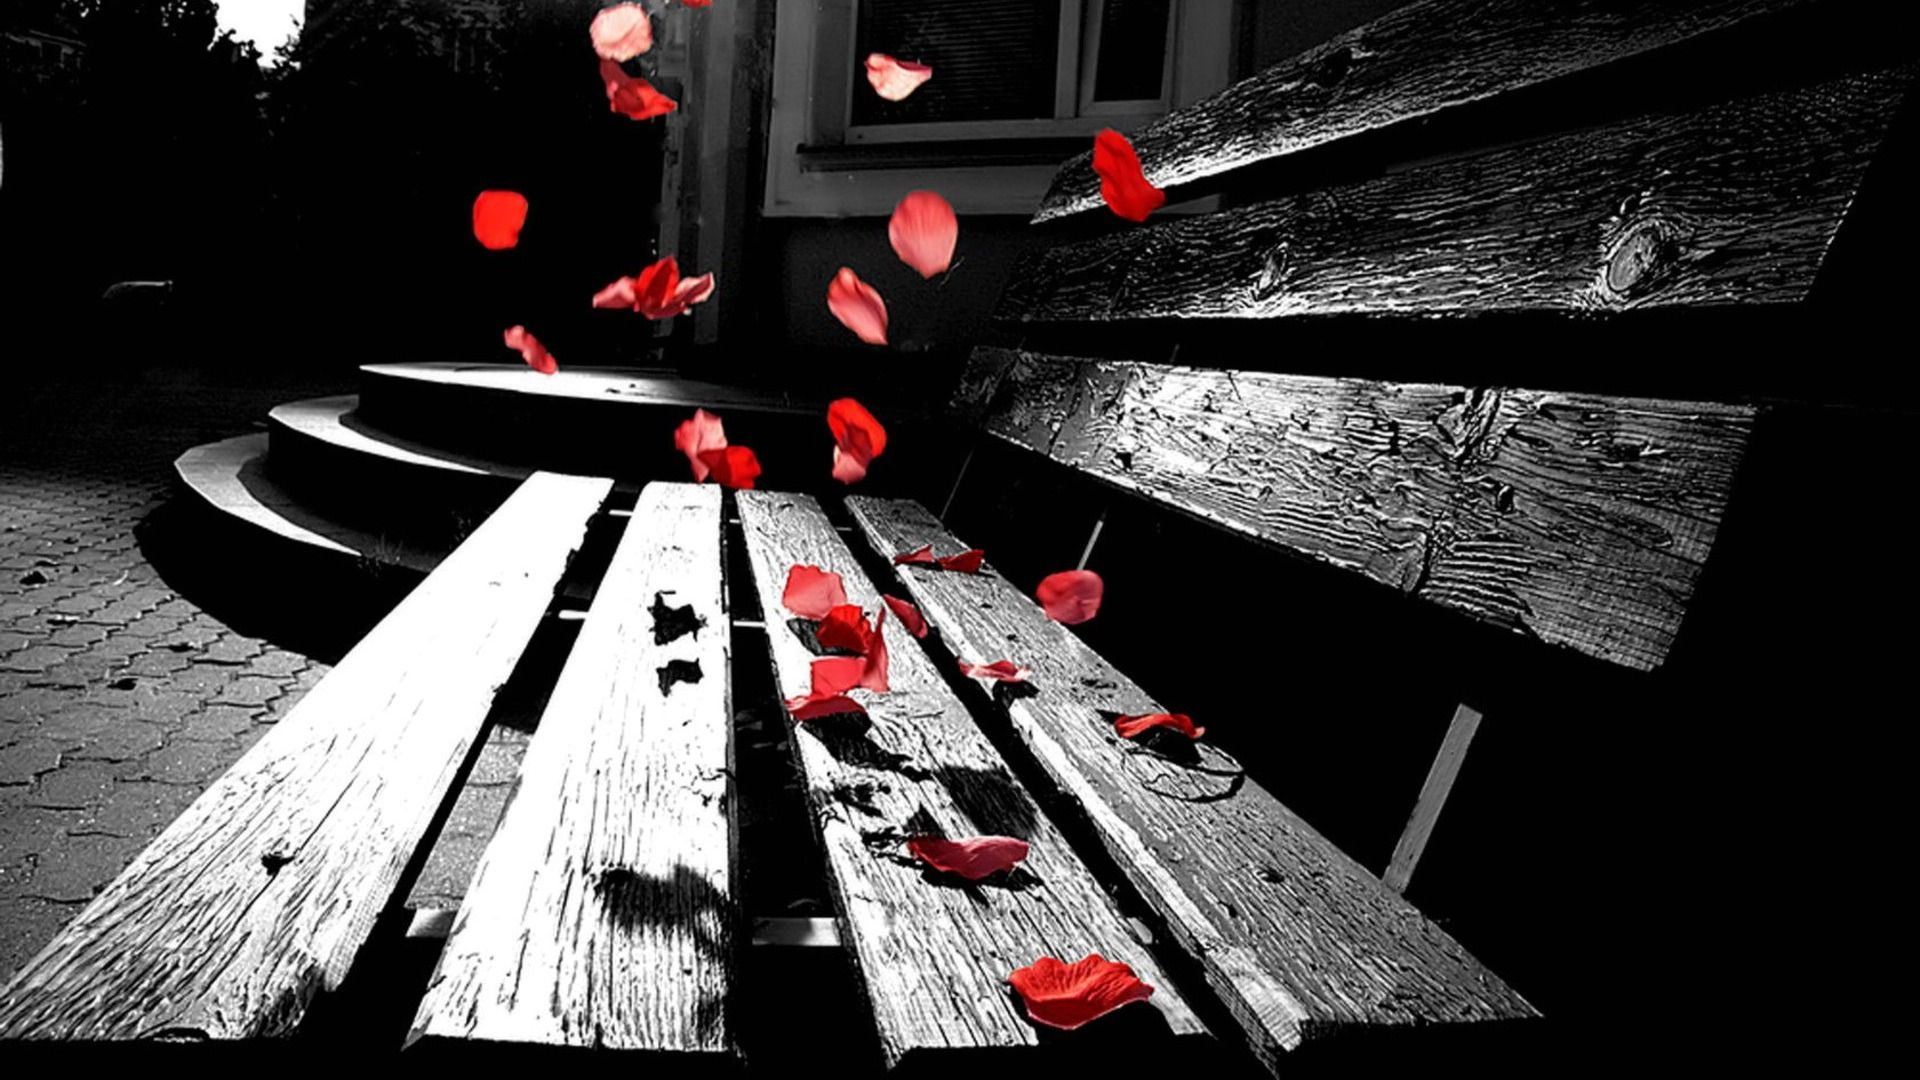 Man Made Bench Wallpaper Romantic Wallpaper Photography Wallpaper Color Splash Photography